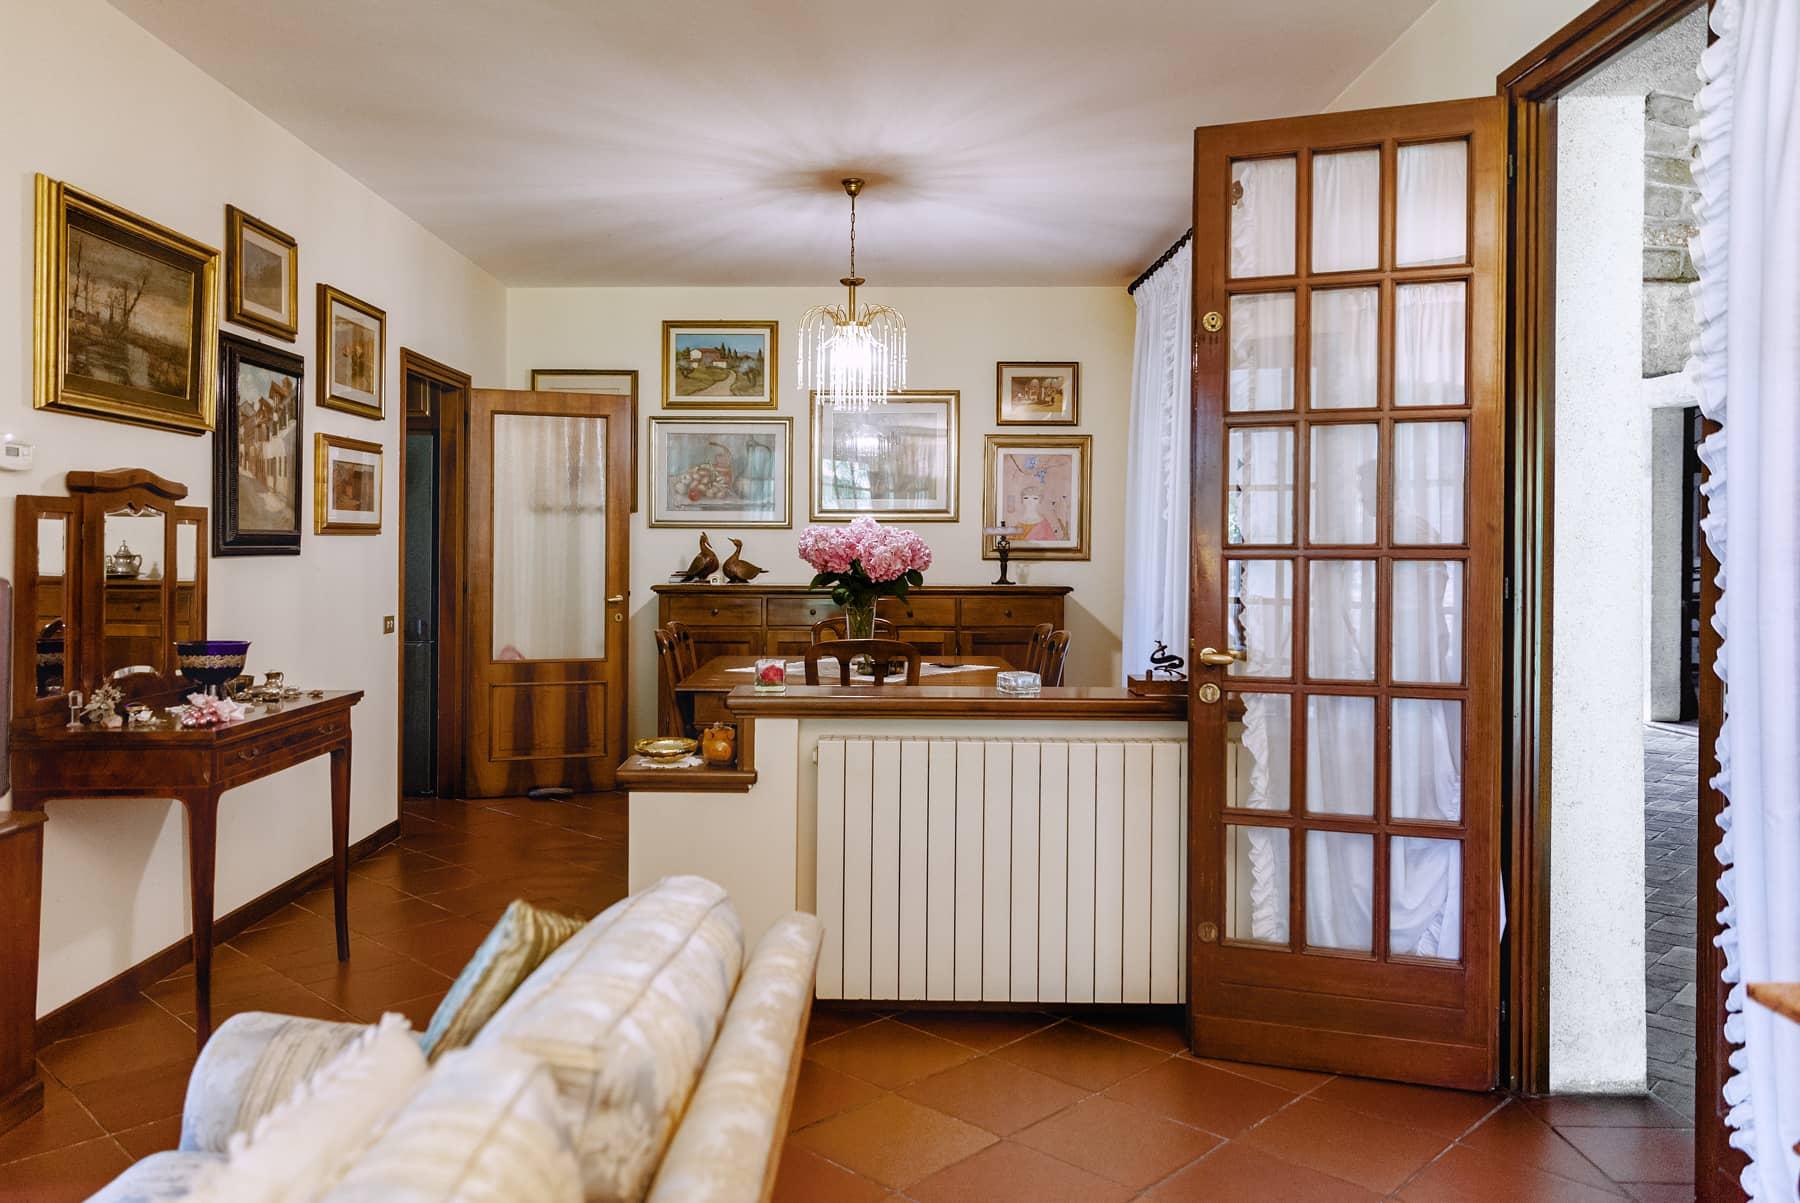 Villa in Vendita a Carbonera: 5 locali, 850 mq - Foto 12